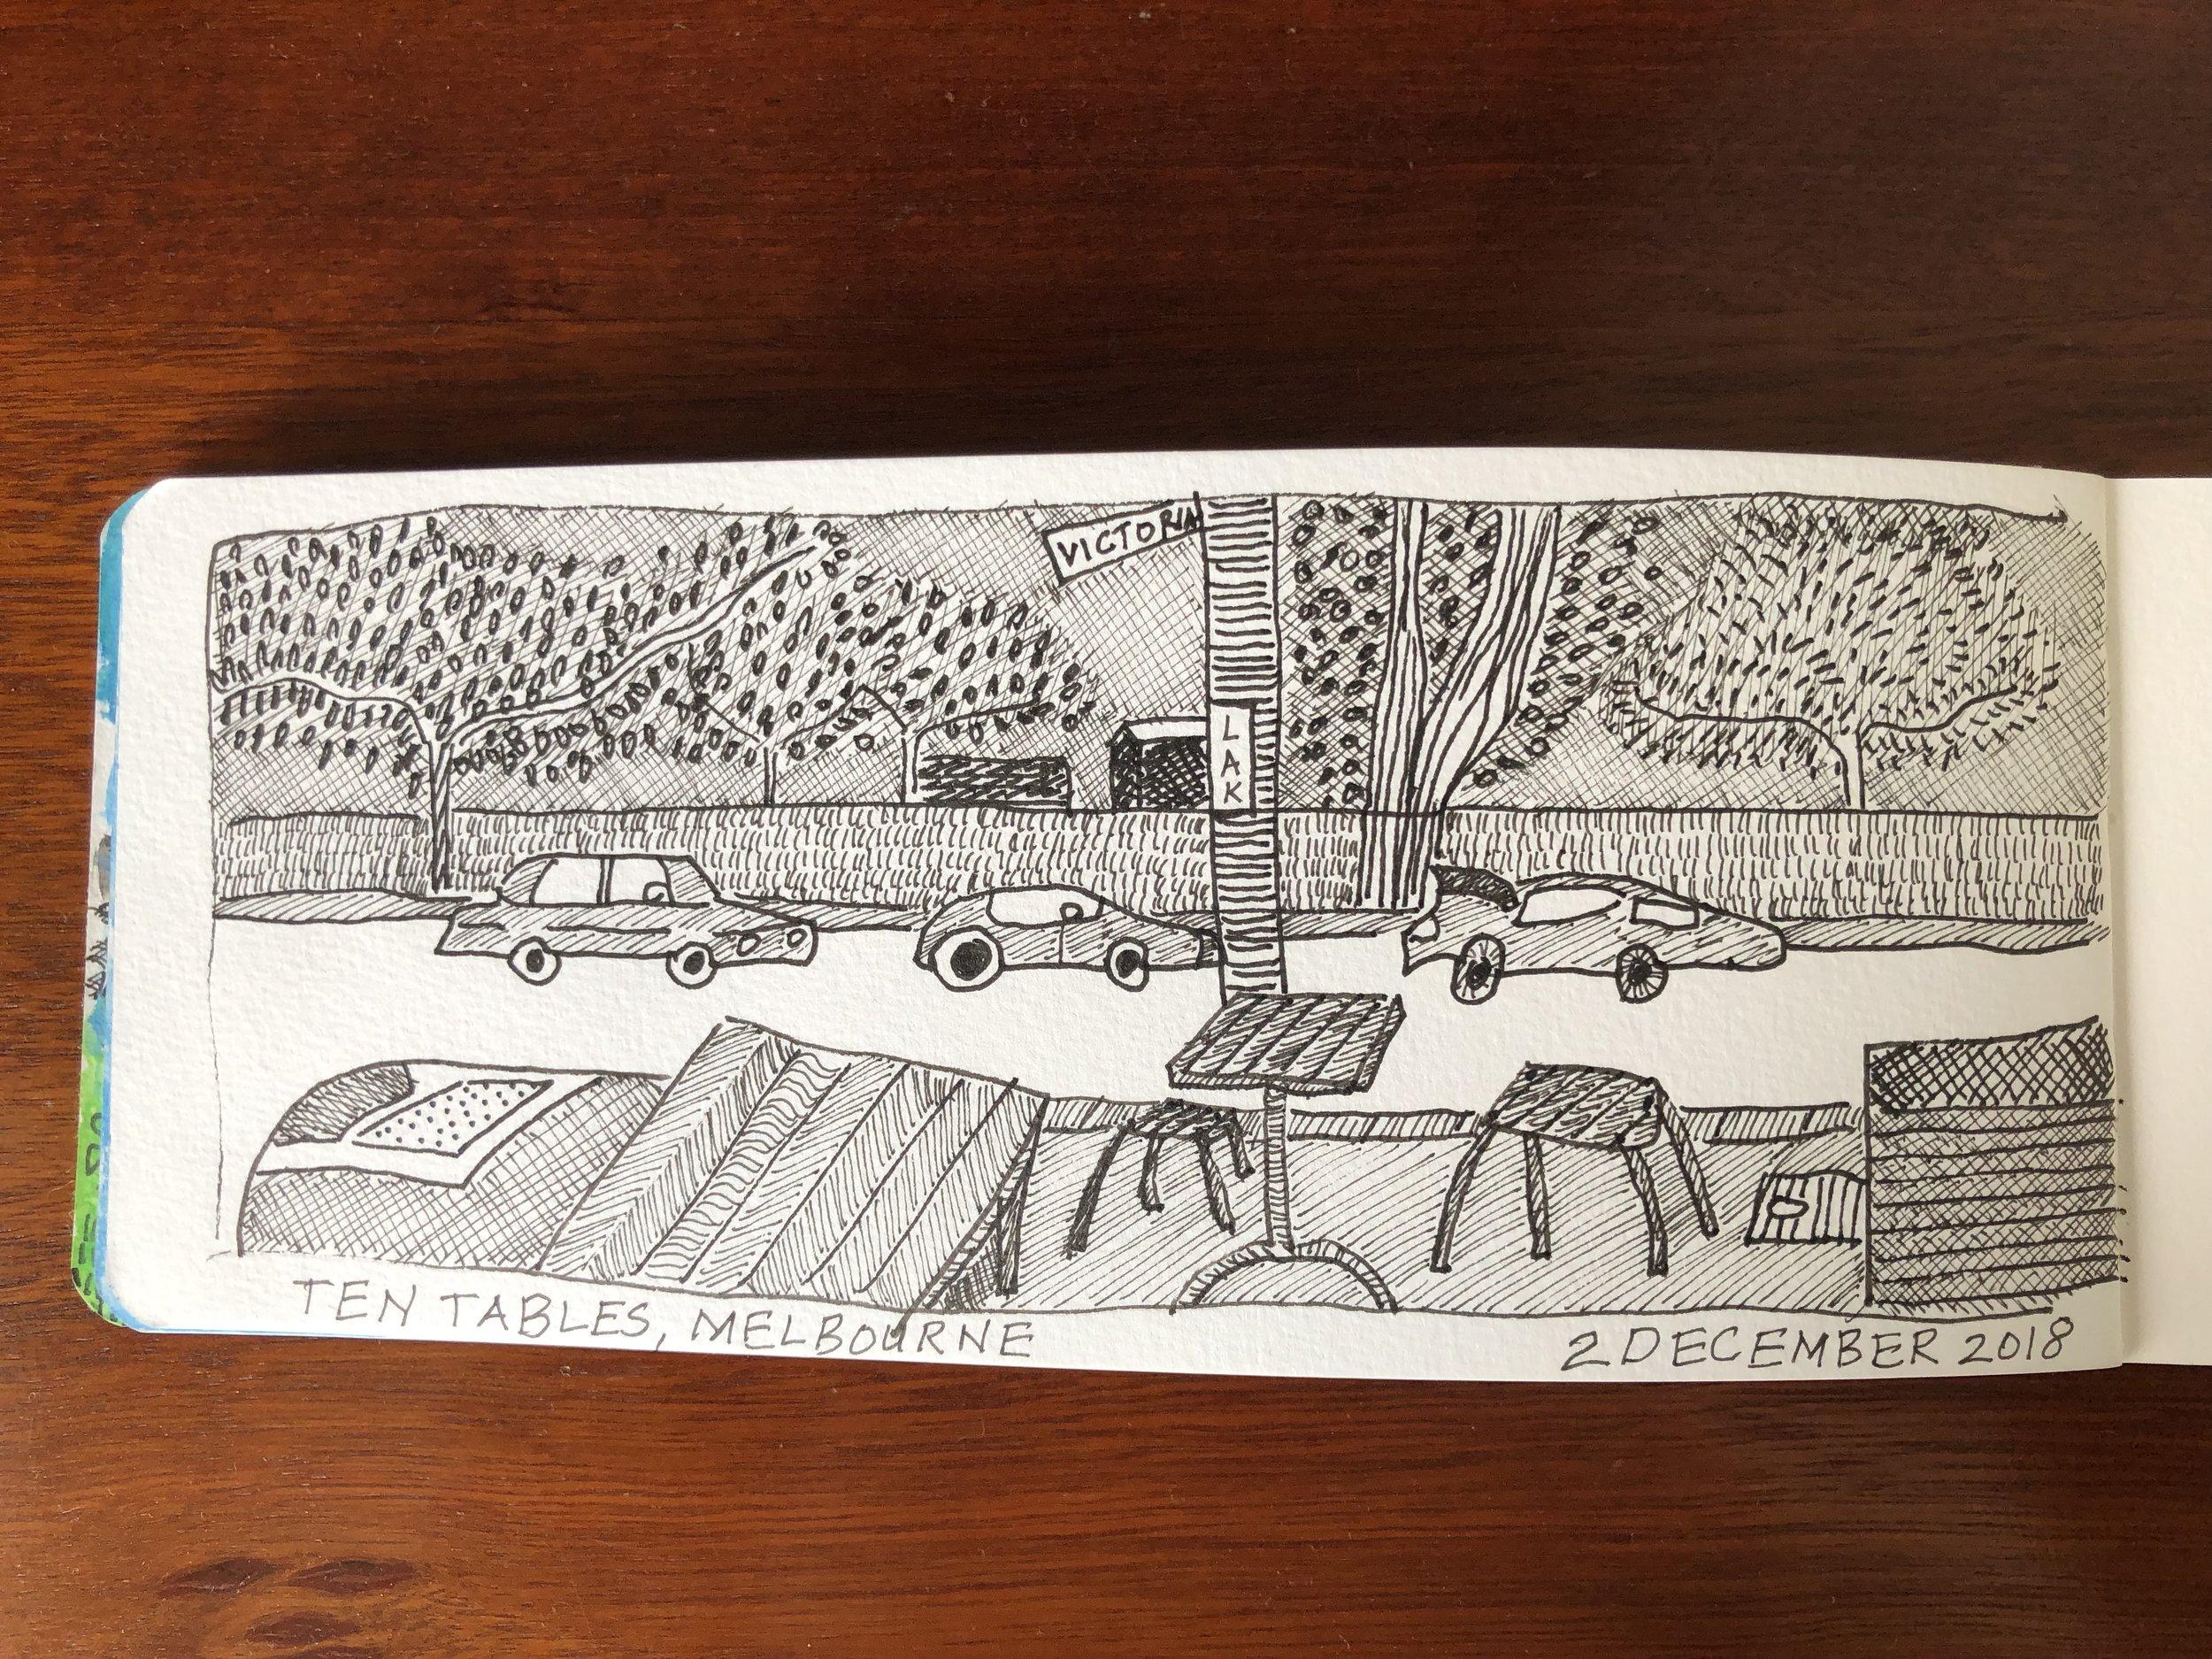 Ten Tables Cafe, Melbourne